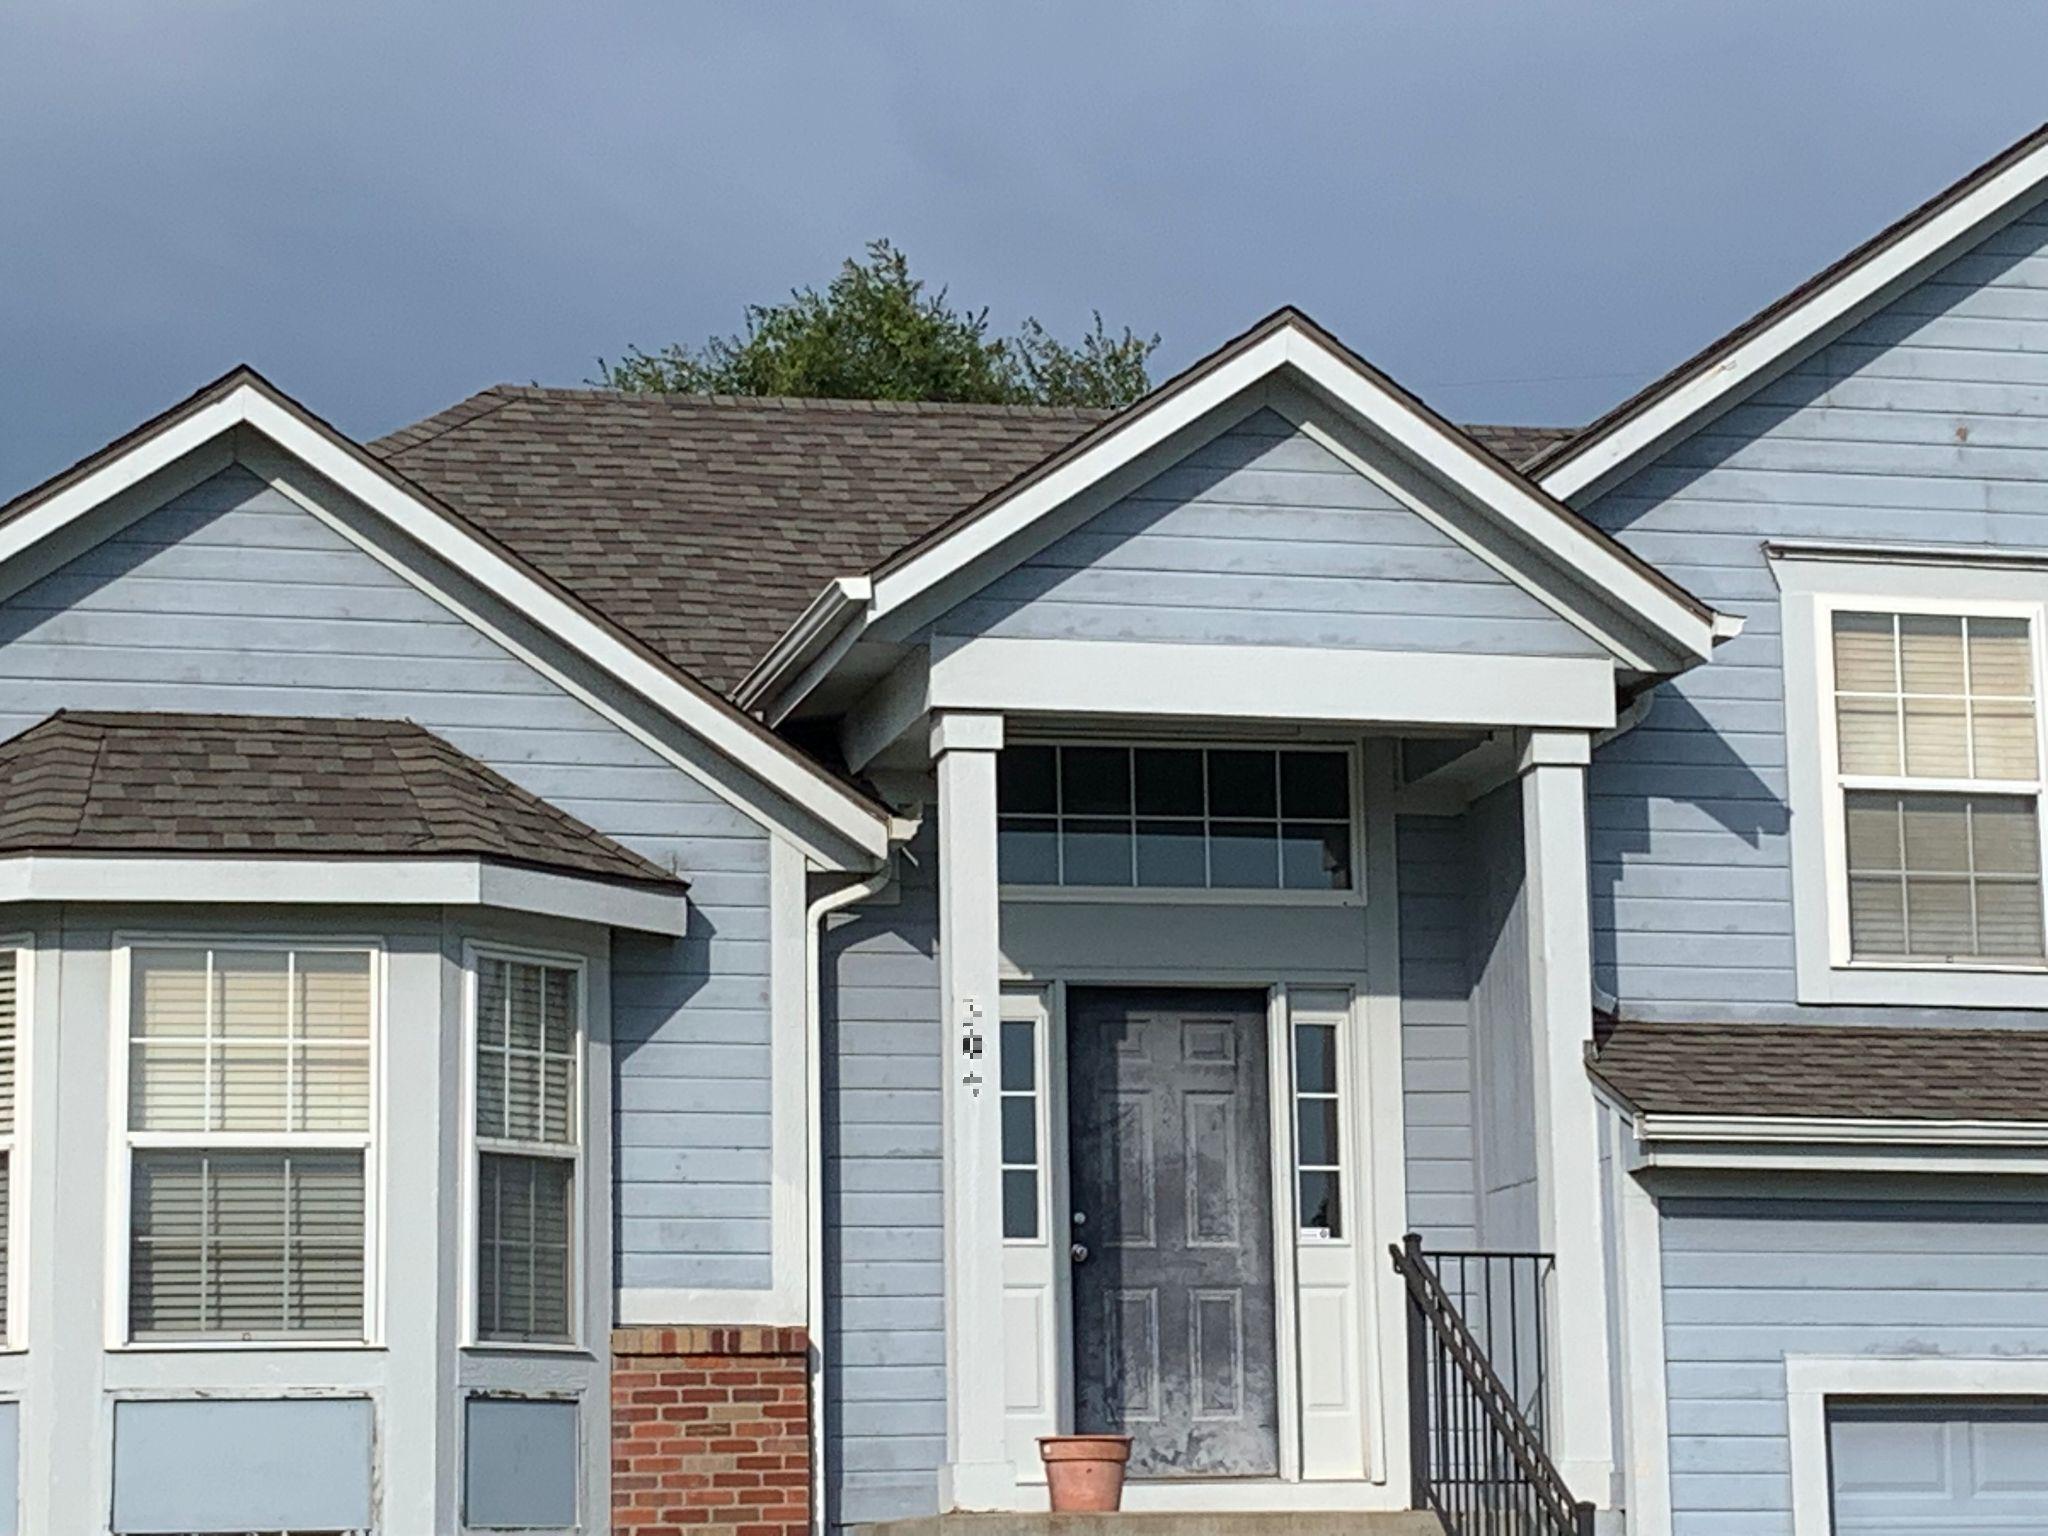 residential roofing company - buck roofing - kansas and missouri - certainteed landmark - weathered wood